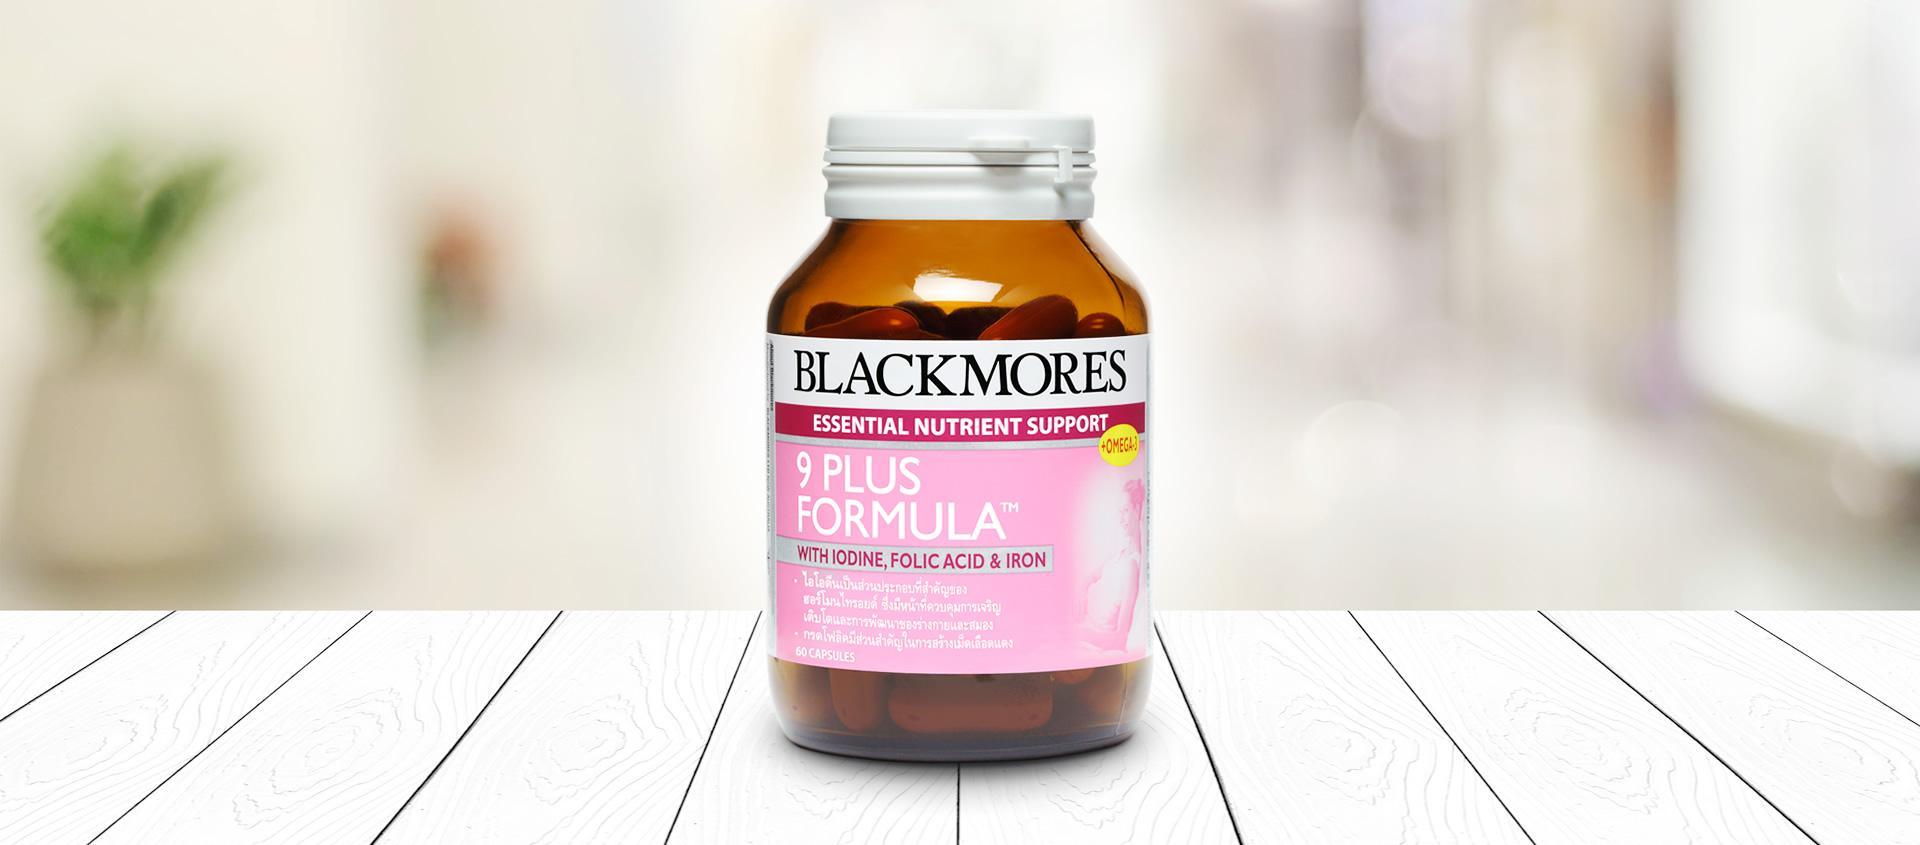 Blackmores 9 Plus Formula แบลคมอร์ส 9 พลัส ฟอร์มูลา (ผลิตภัณฑ์เสริมอาหาร)